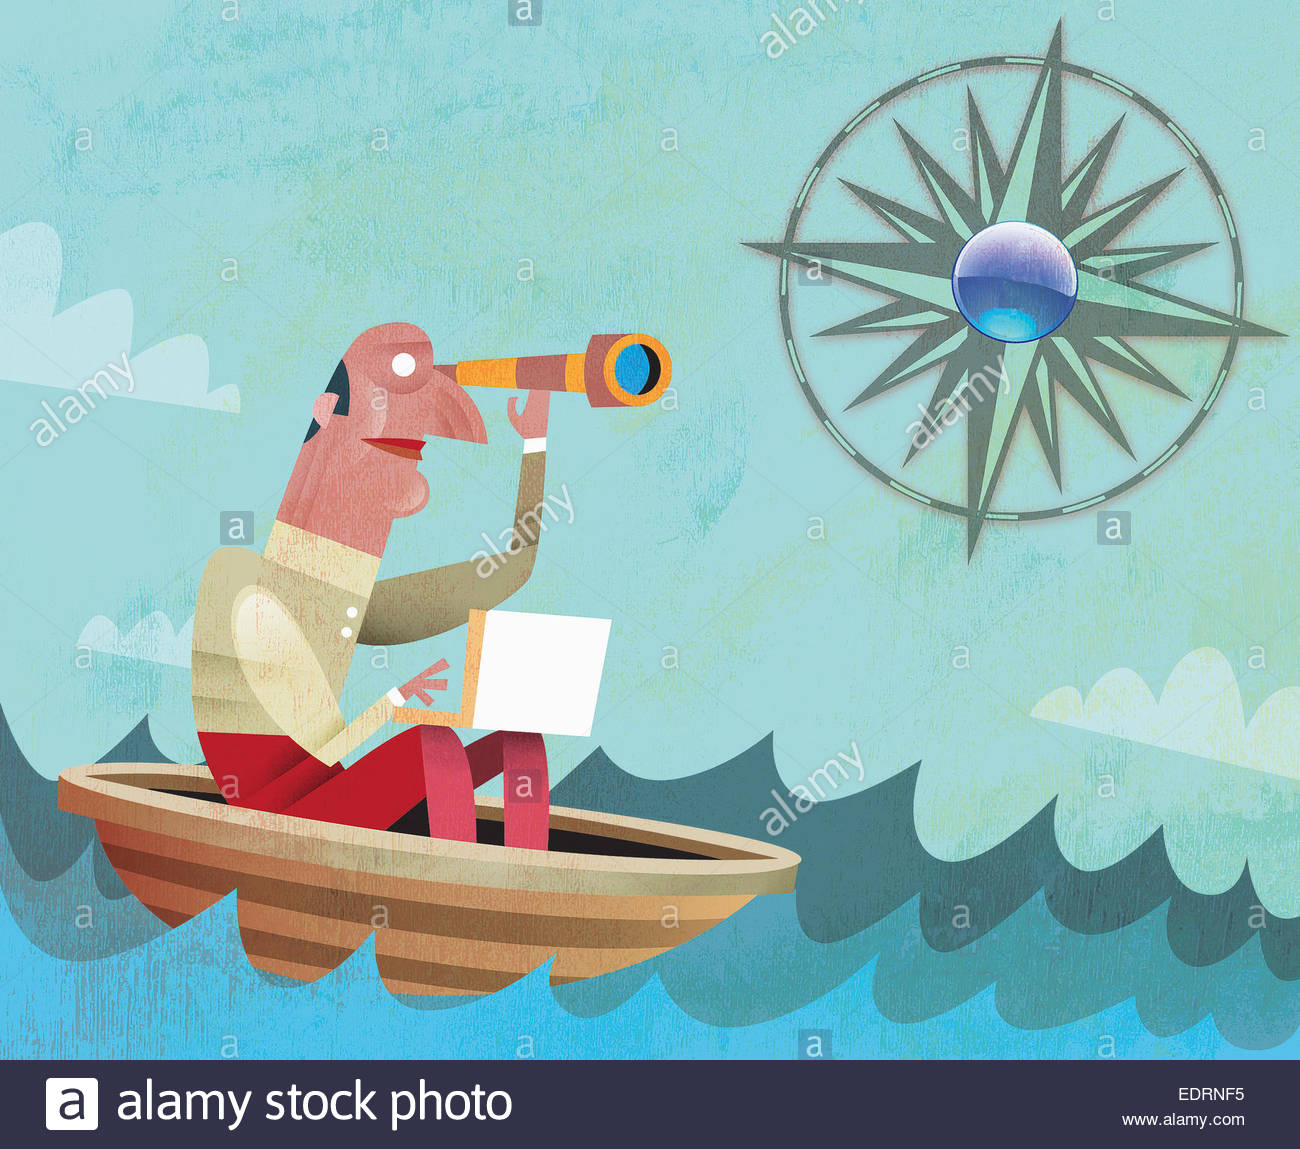 Man in boat looking through telescope towards compass sun - Stock Image